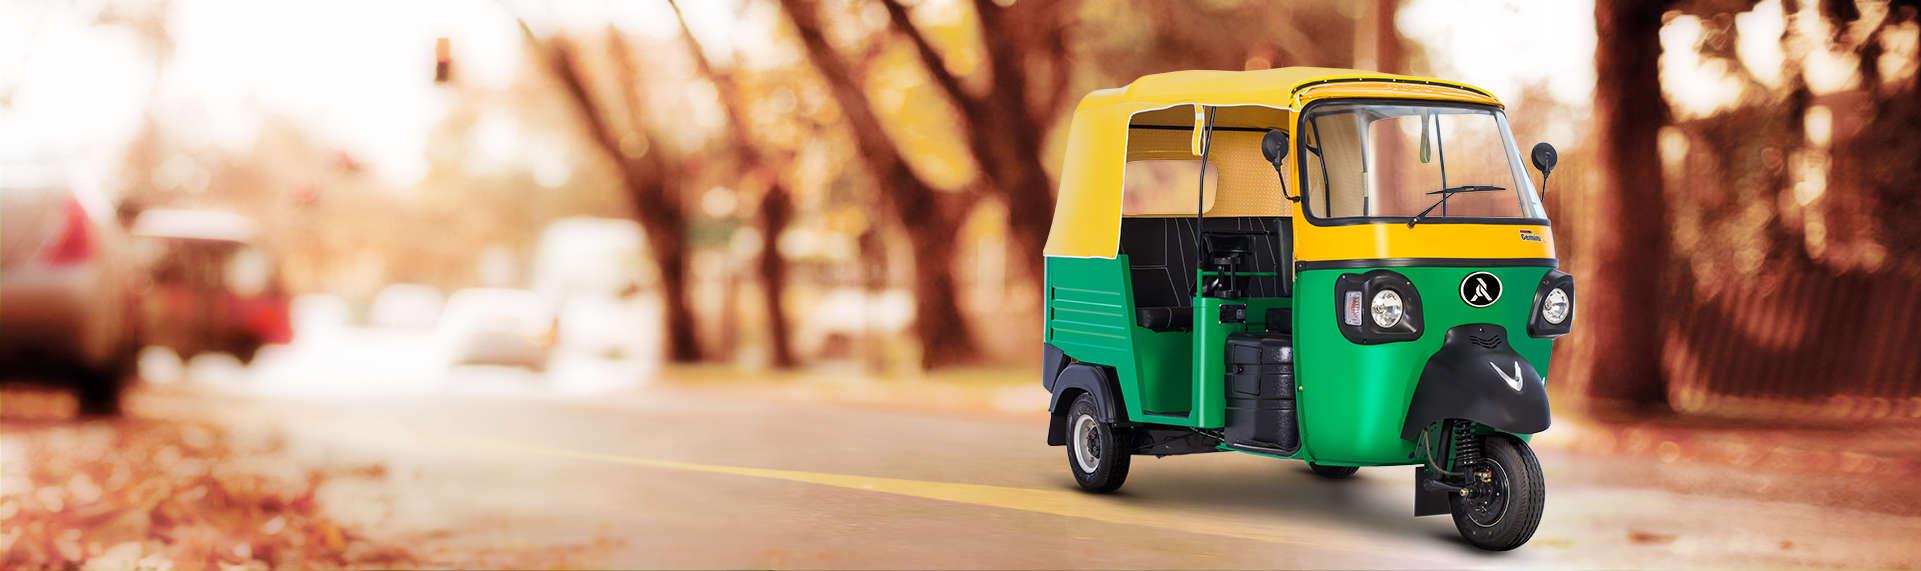 Atul Auto Atul Auto Sales Up 7 34 To 4 297 Units In November